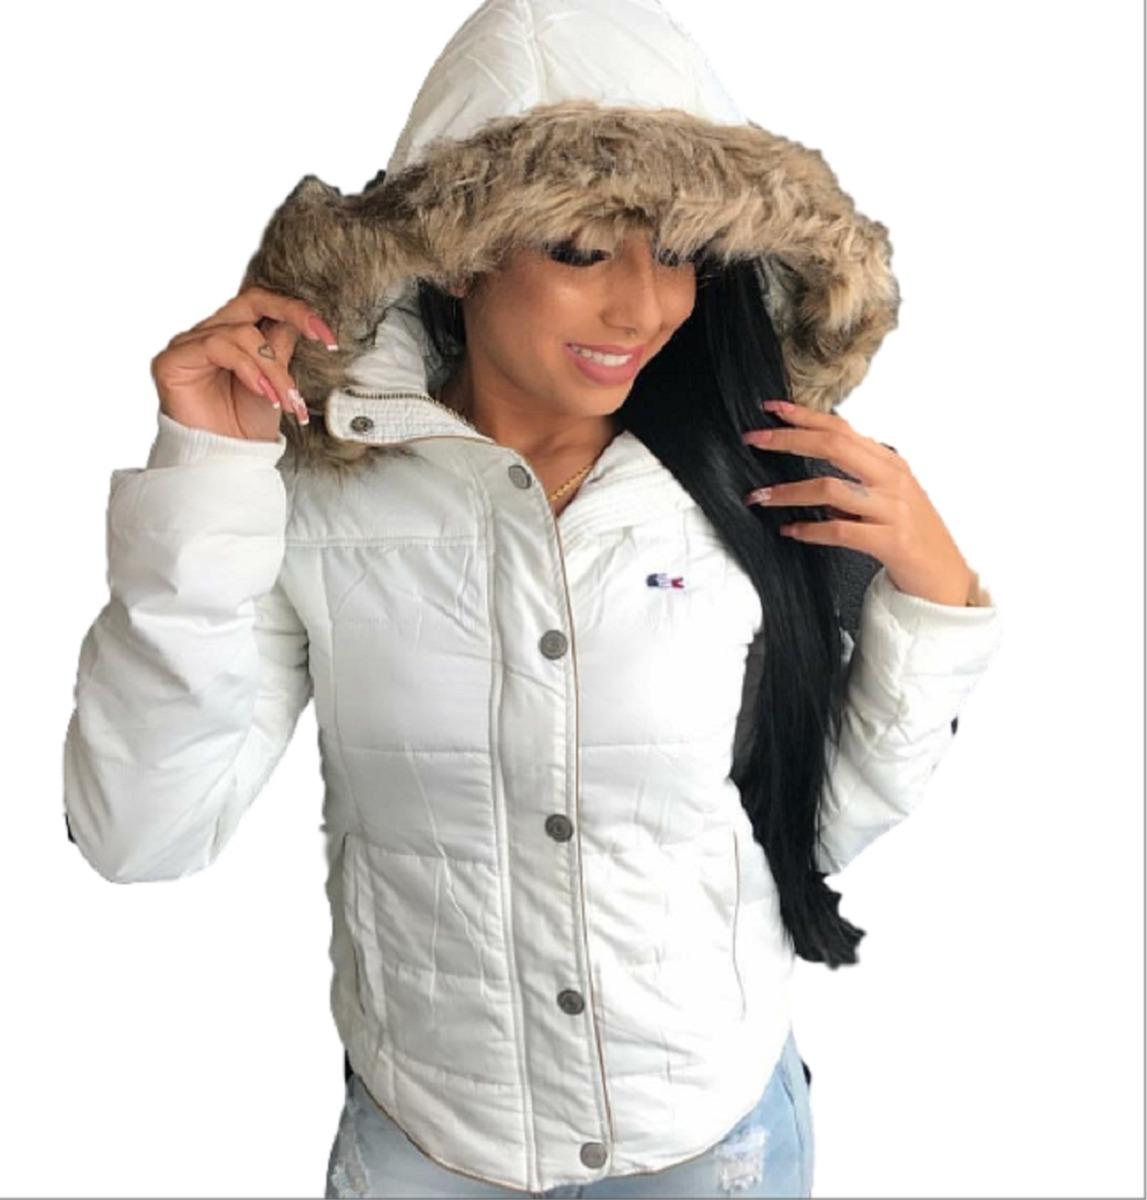 ea33d68d0fd casaco feminino lacoste luxo promoção. Carregando zoom.